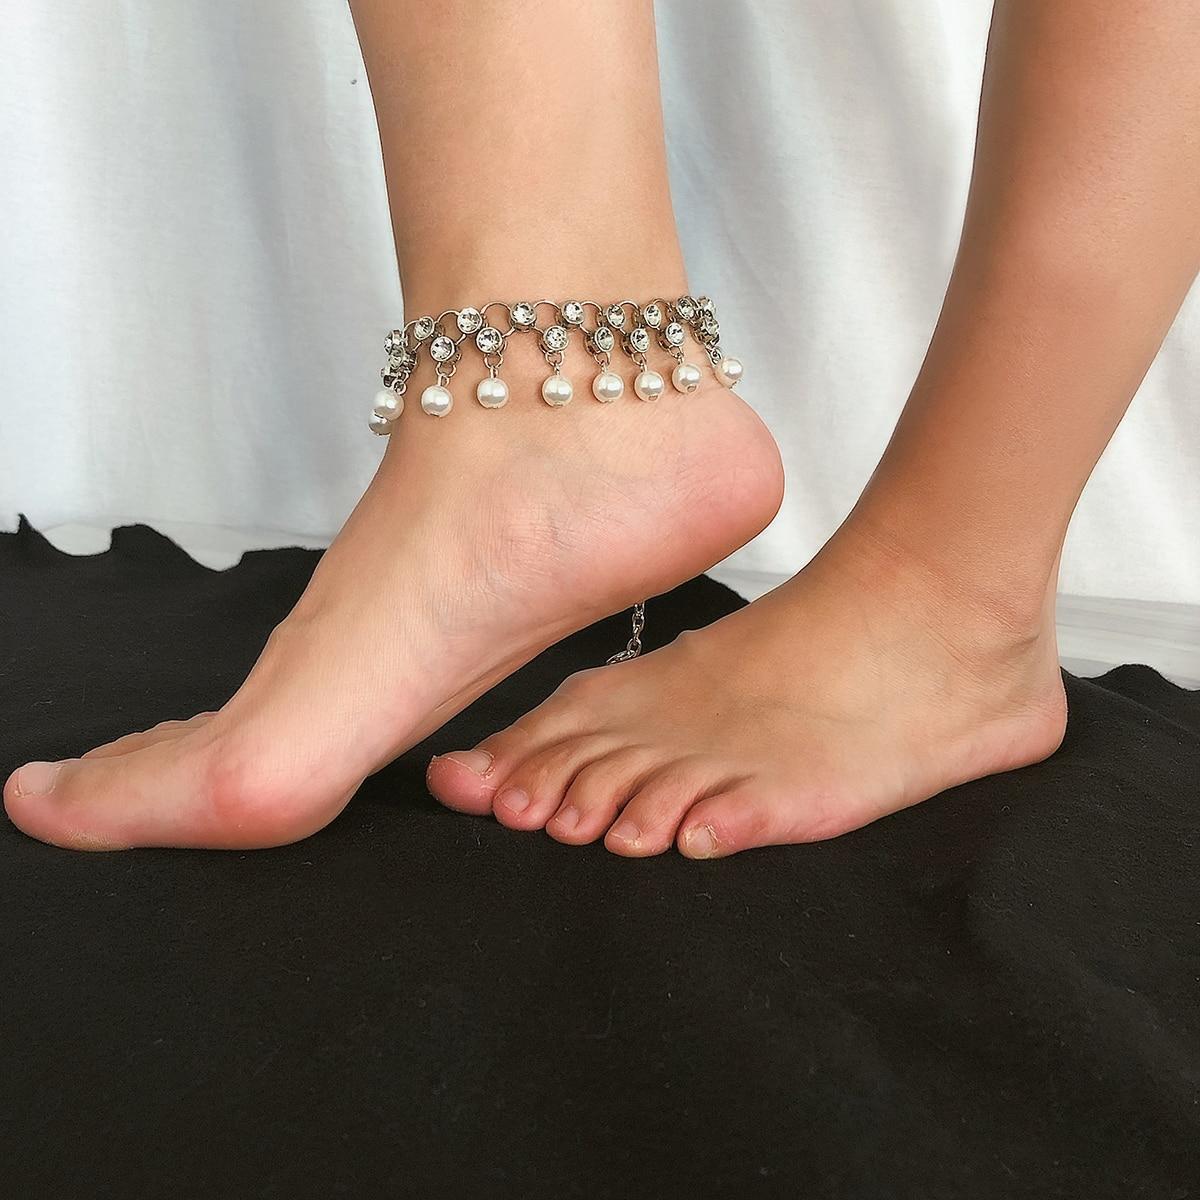 Ingemark Sweet Imitation Pearls Tassel Anklets Bracelet Women Barefoot Sandals Korean Luxury Shiny Rhinestone Ankle Foot Jewelry in Anklets from Jewelry Accessories